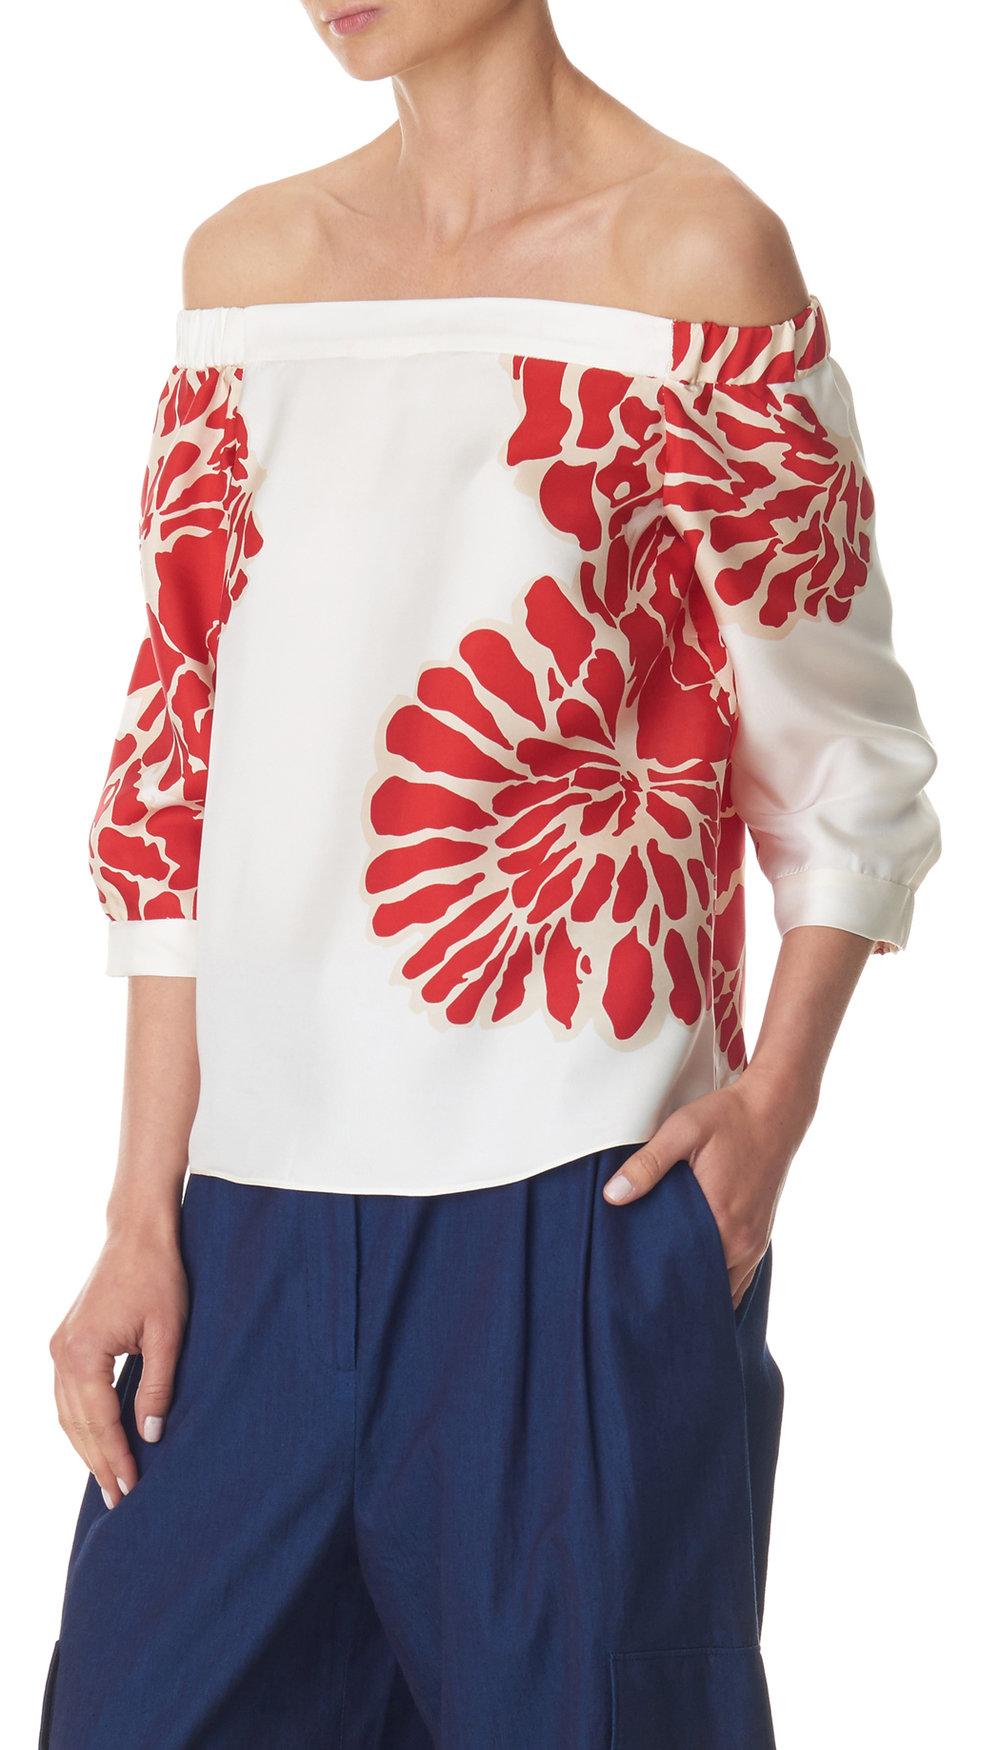 Tibi Orla Bloom Off Shoulder Top in Silk Twill,$365, at Tibi.com